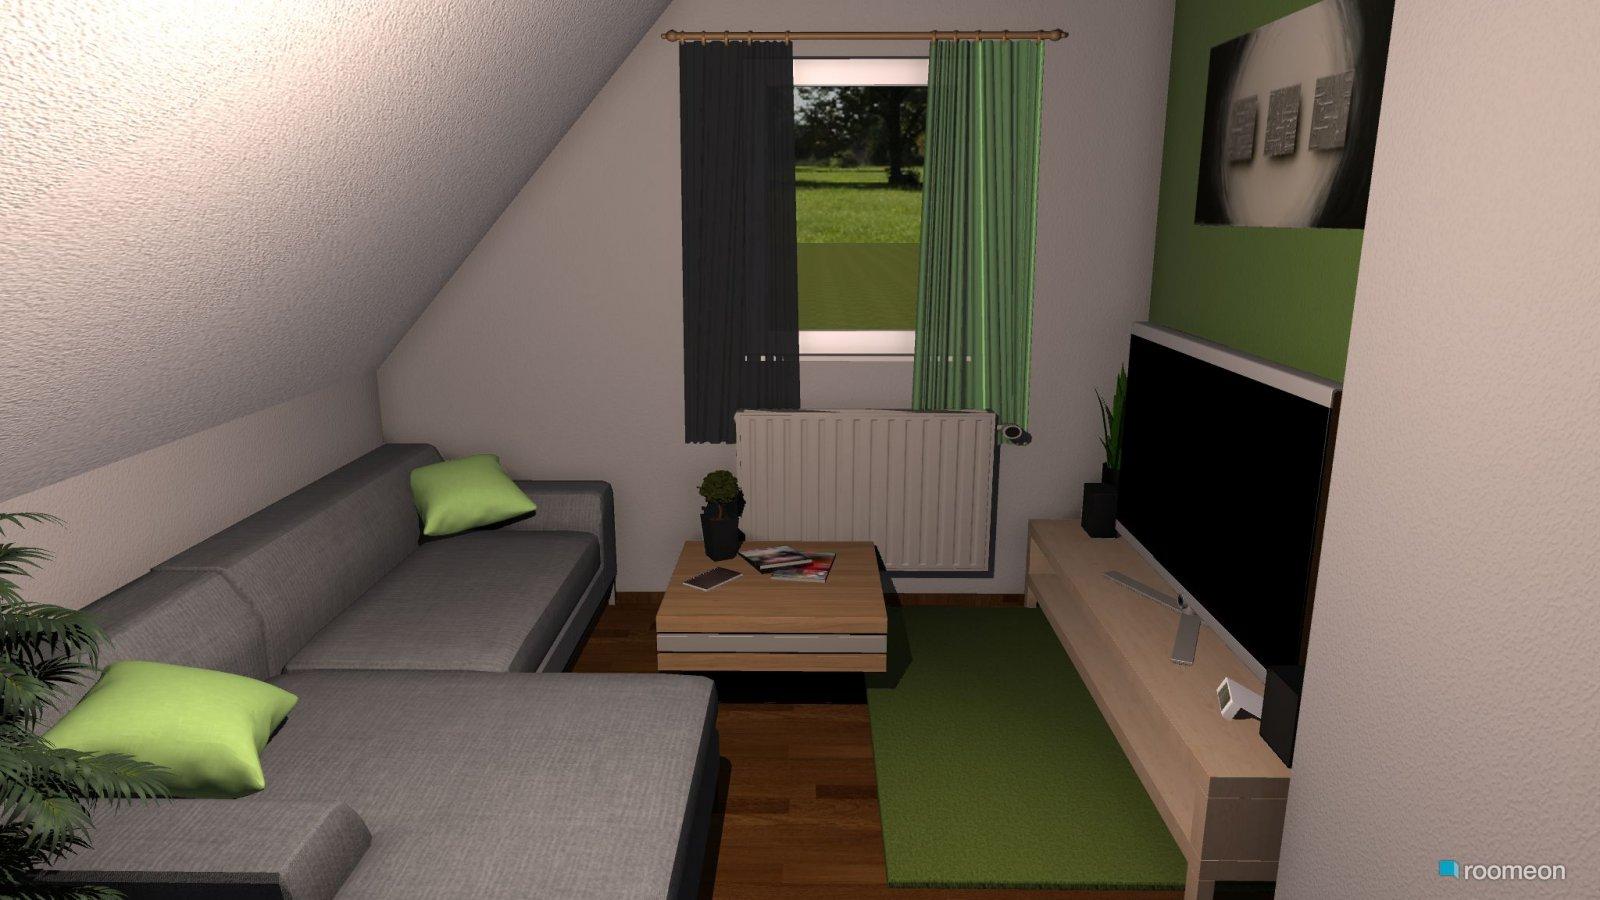 Room Design Cooles Zimmer Roomeon Community